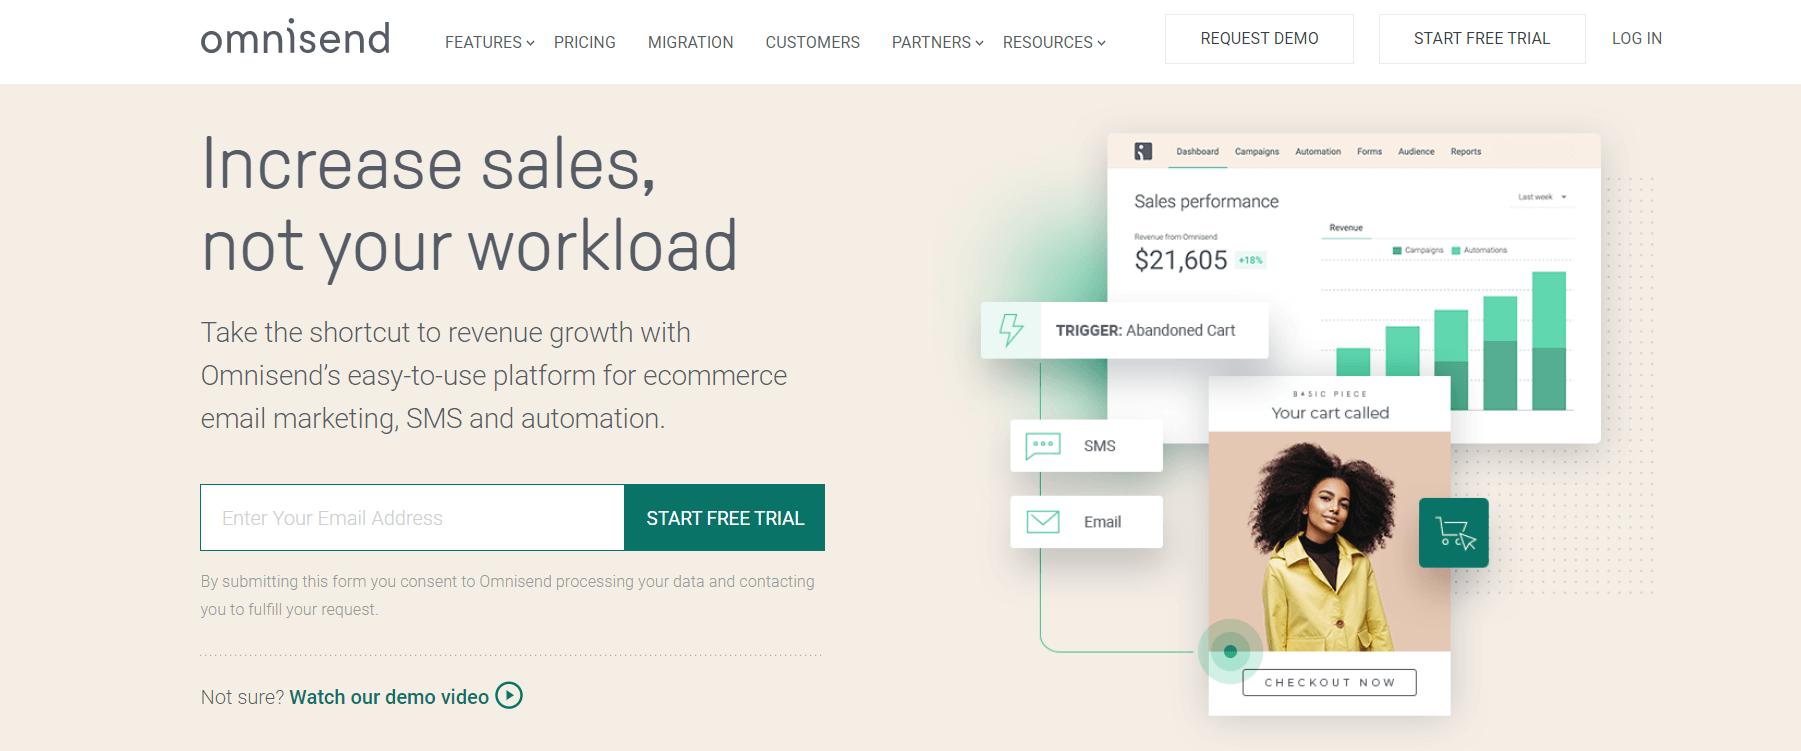 Omnisend-best-Email-Marketing-Software